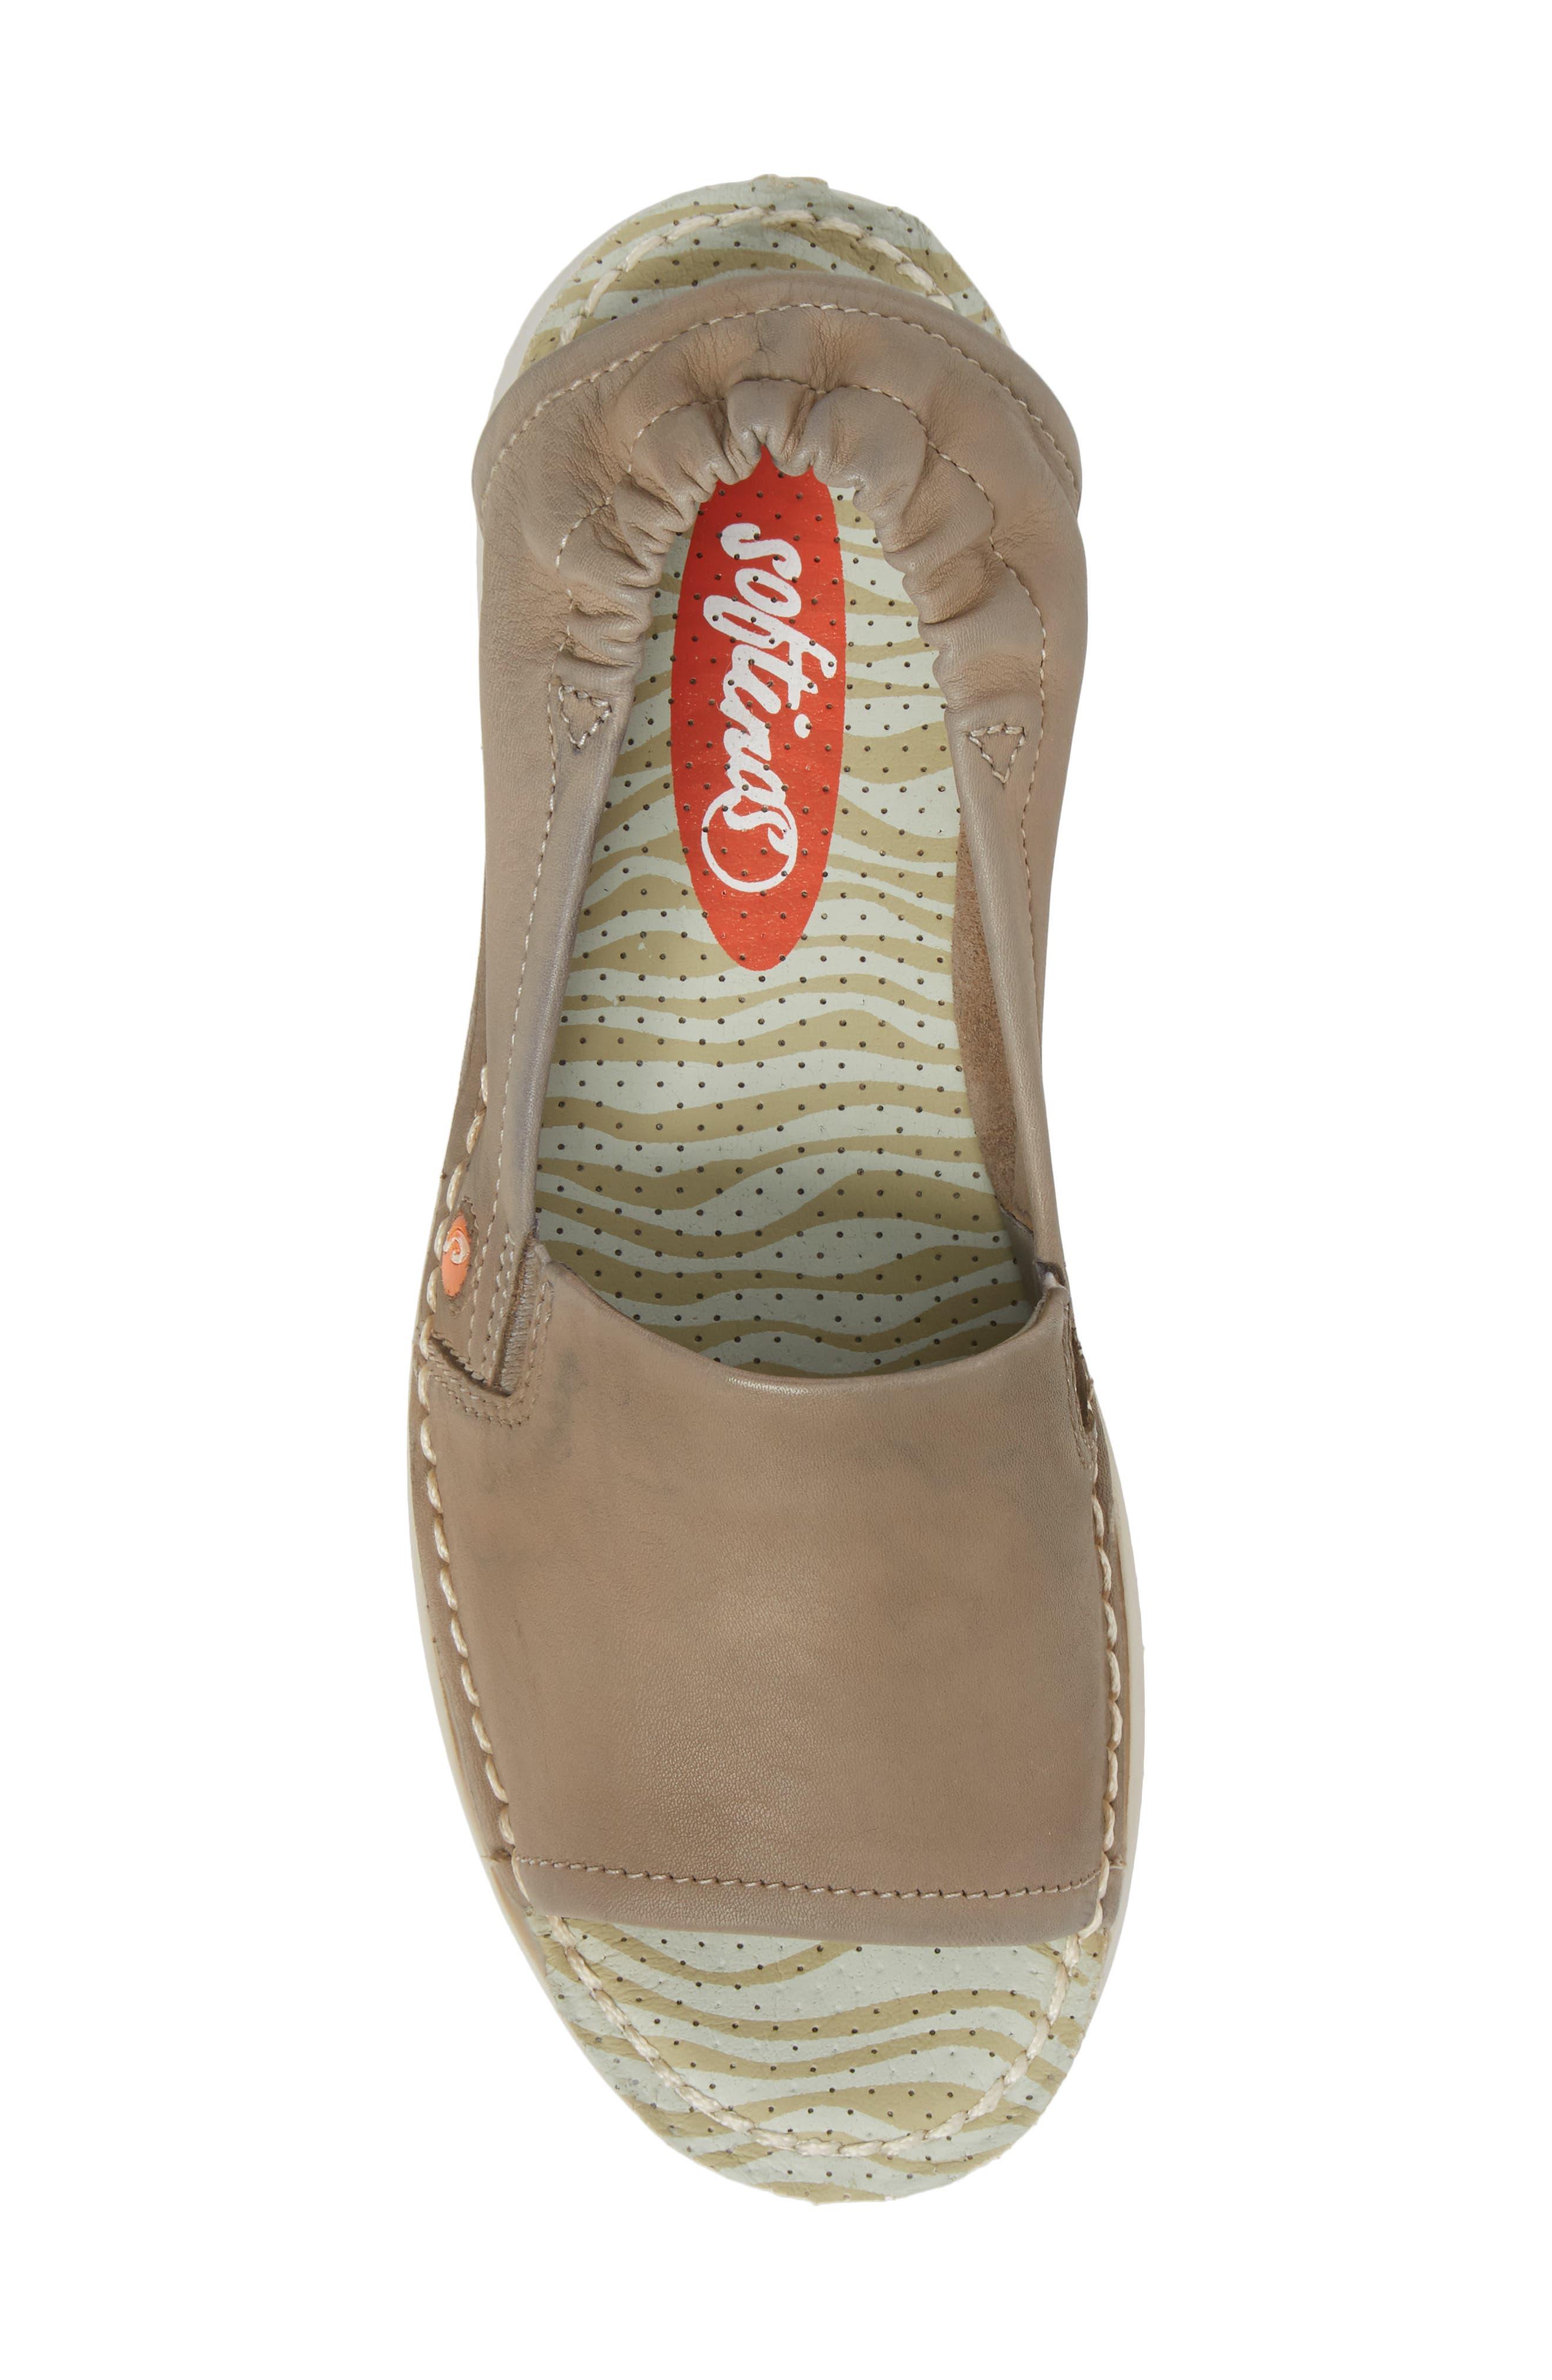 Tee Flat Sandal,                             Alternate thumbnail 5, color,                             Taupe Leather